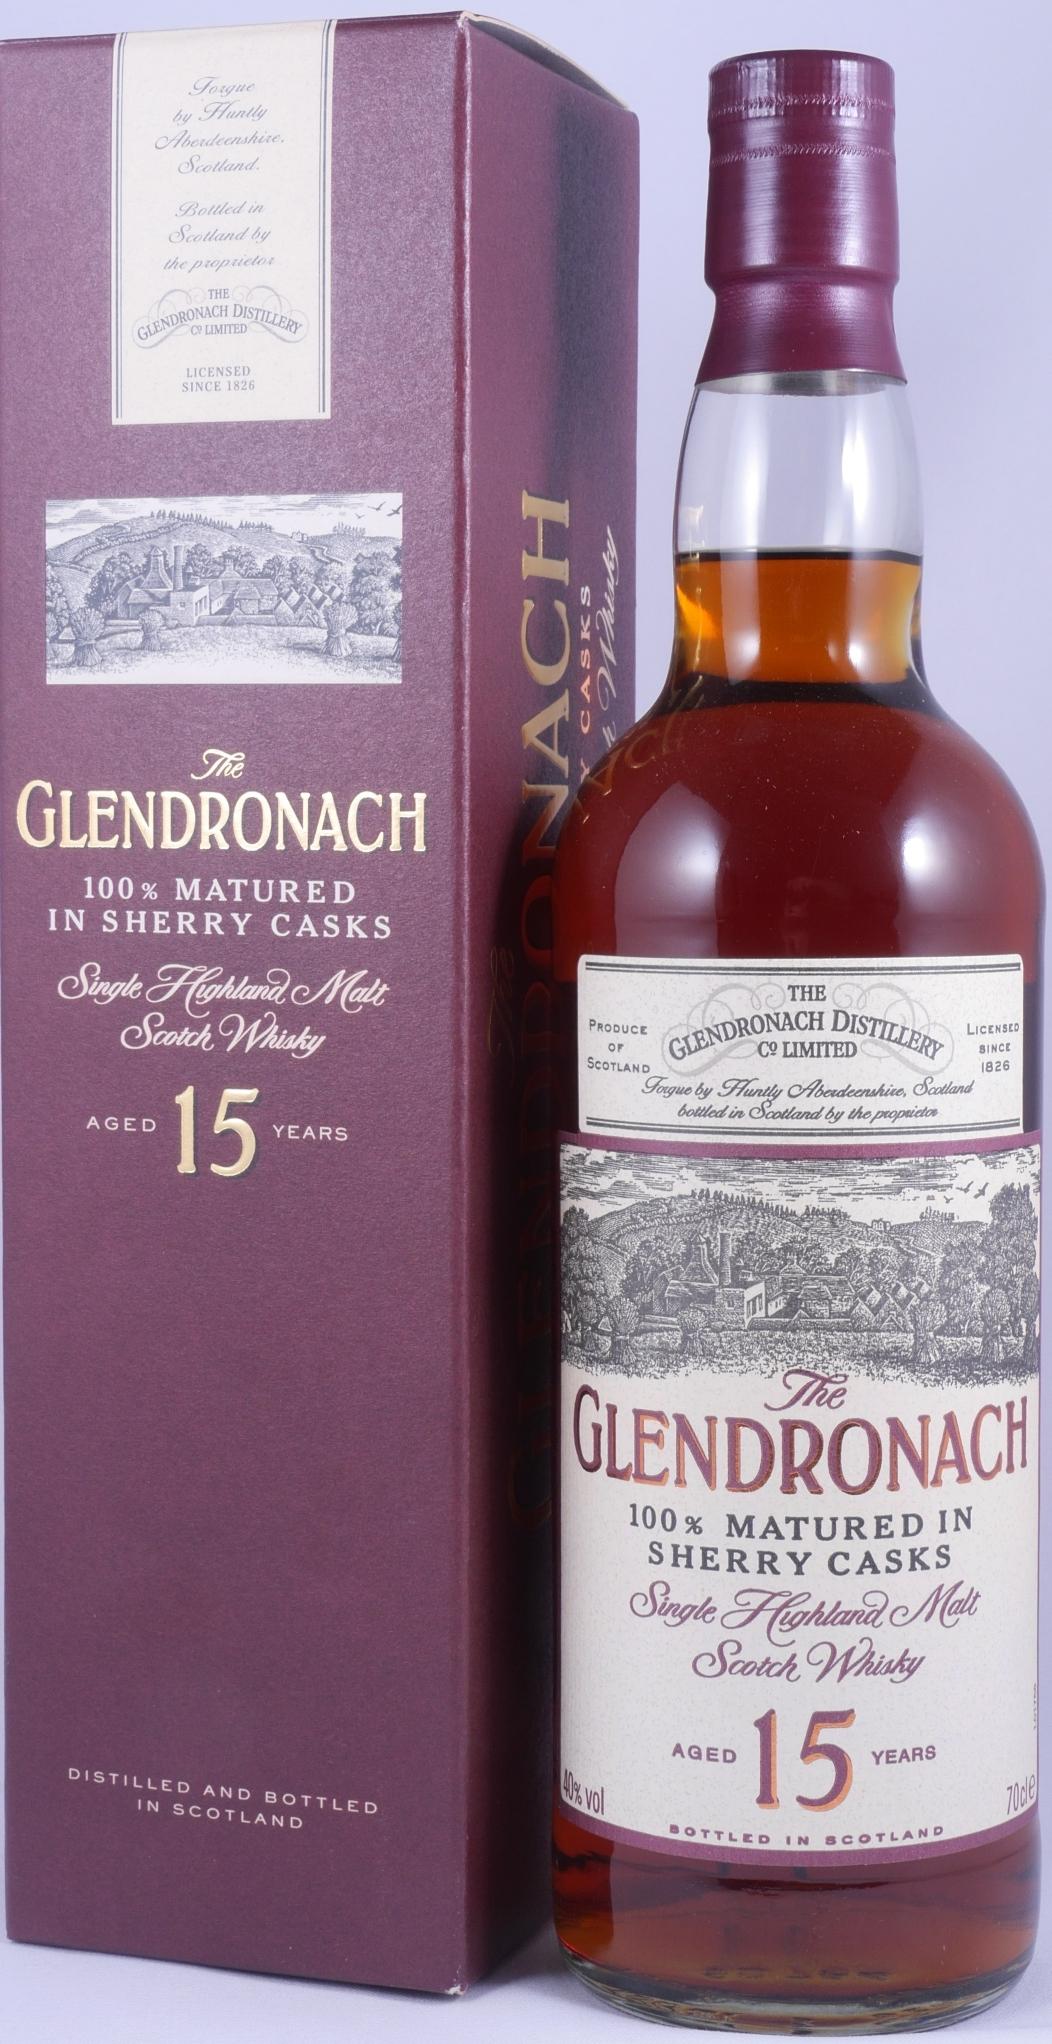 b45c100c505 Glendronach 15 Years Old Bottling 100% Matured in Sherry Casks Highland Single  Malt Scotch Whisky